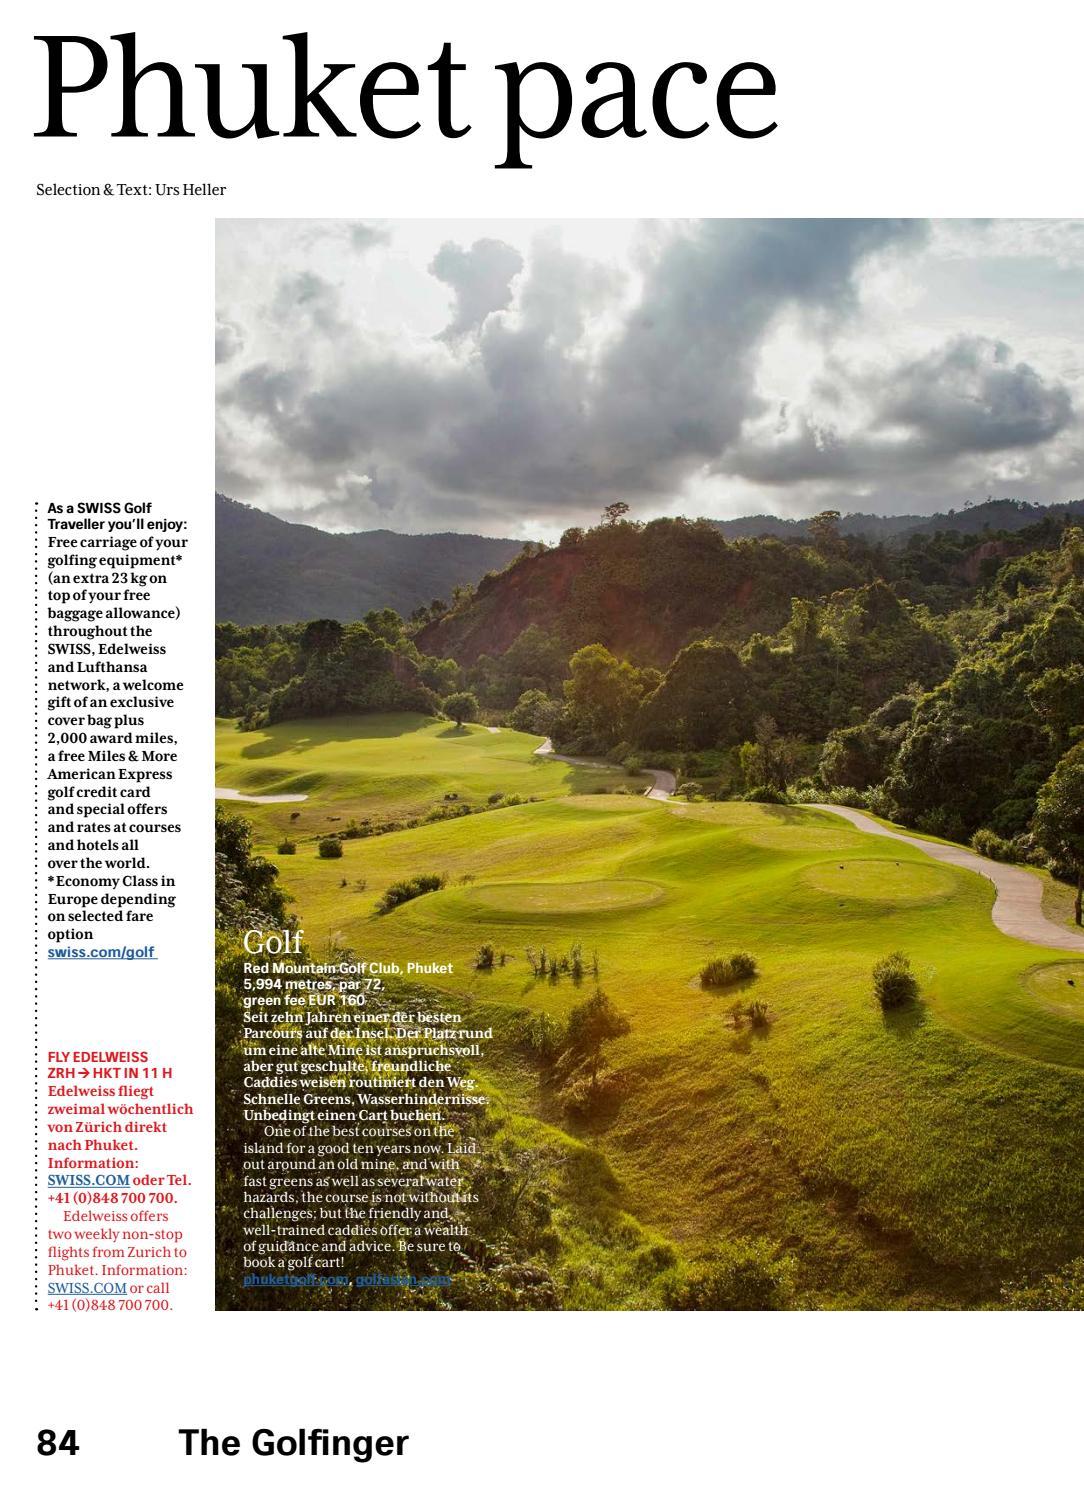 SWISS Magazine December 2017/January 2018 - SICILY by Swiss